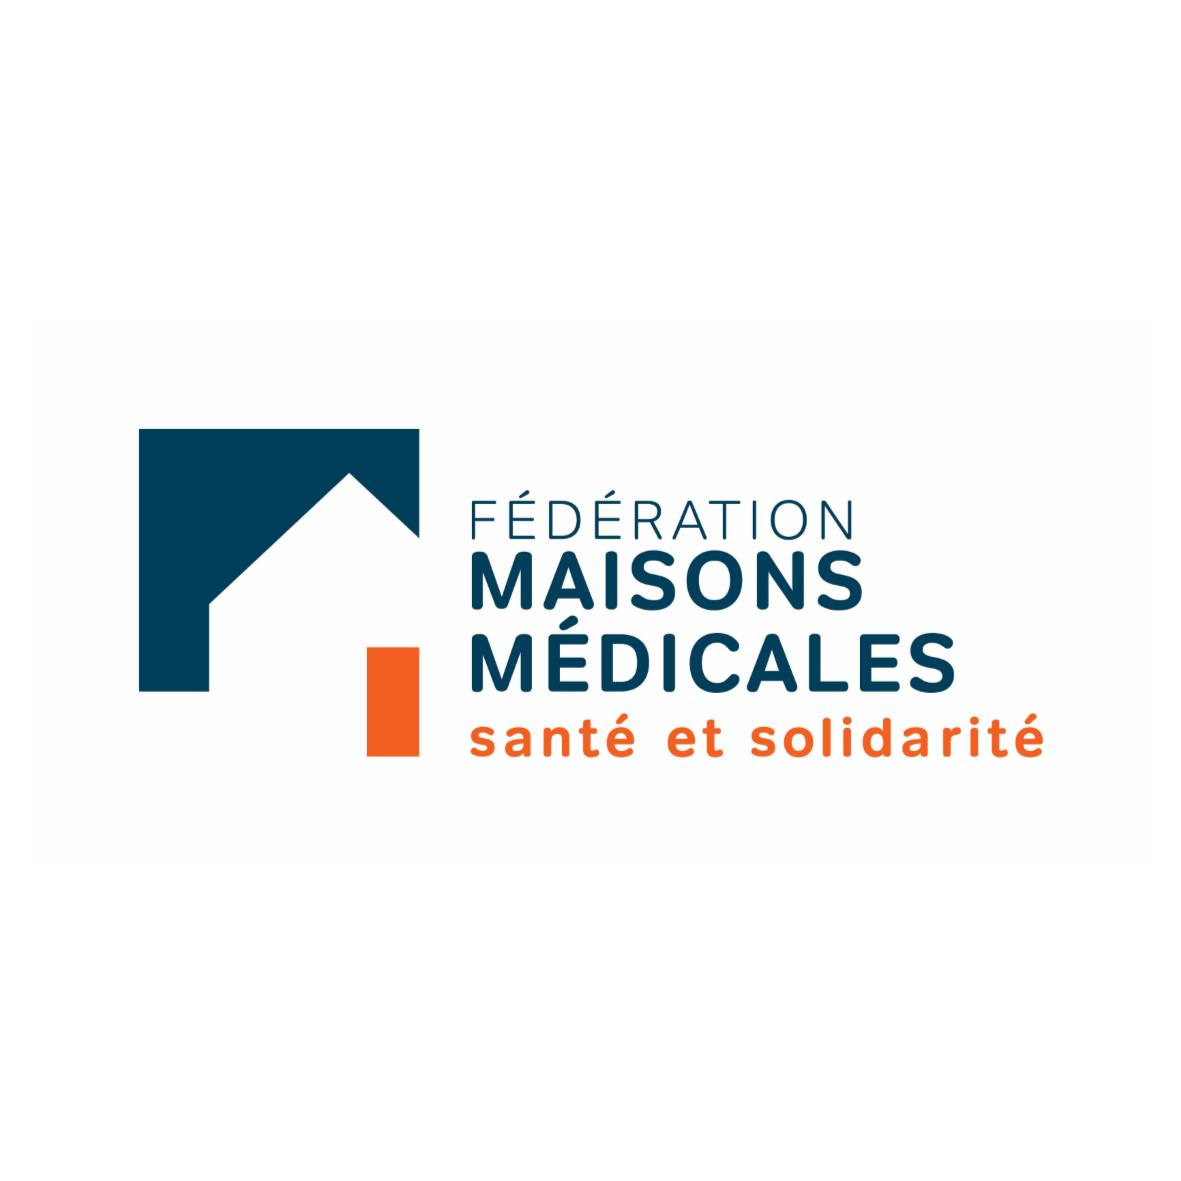 Fédération Maisons Médicales